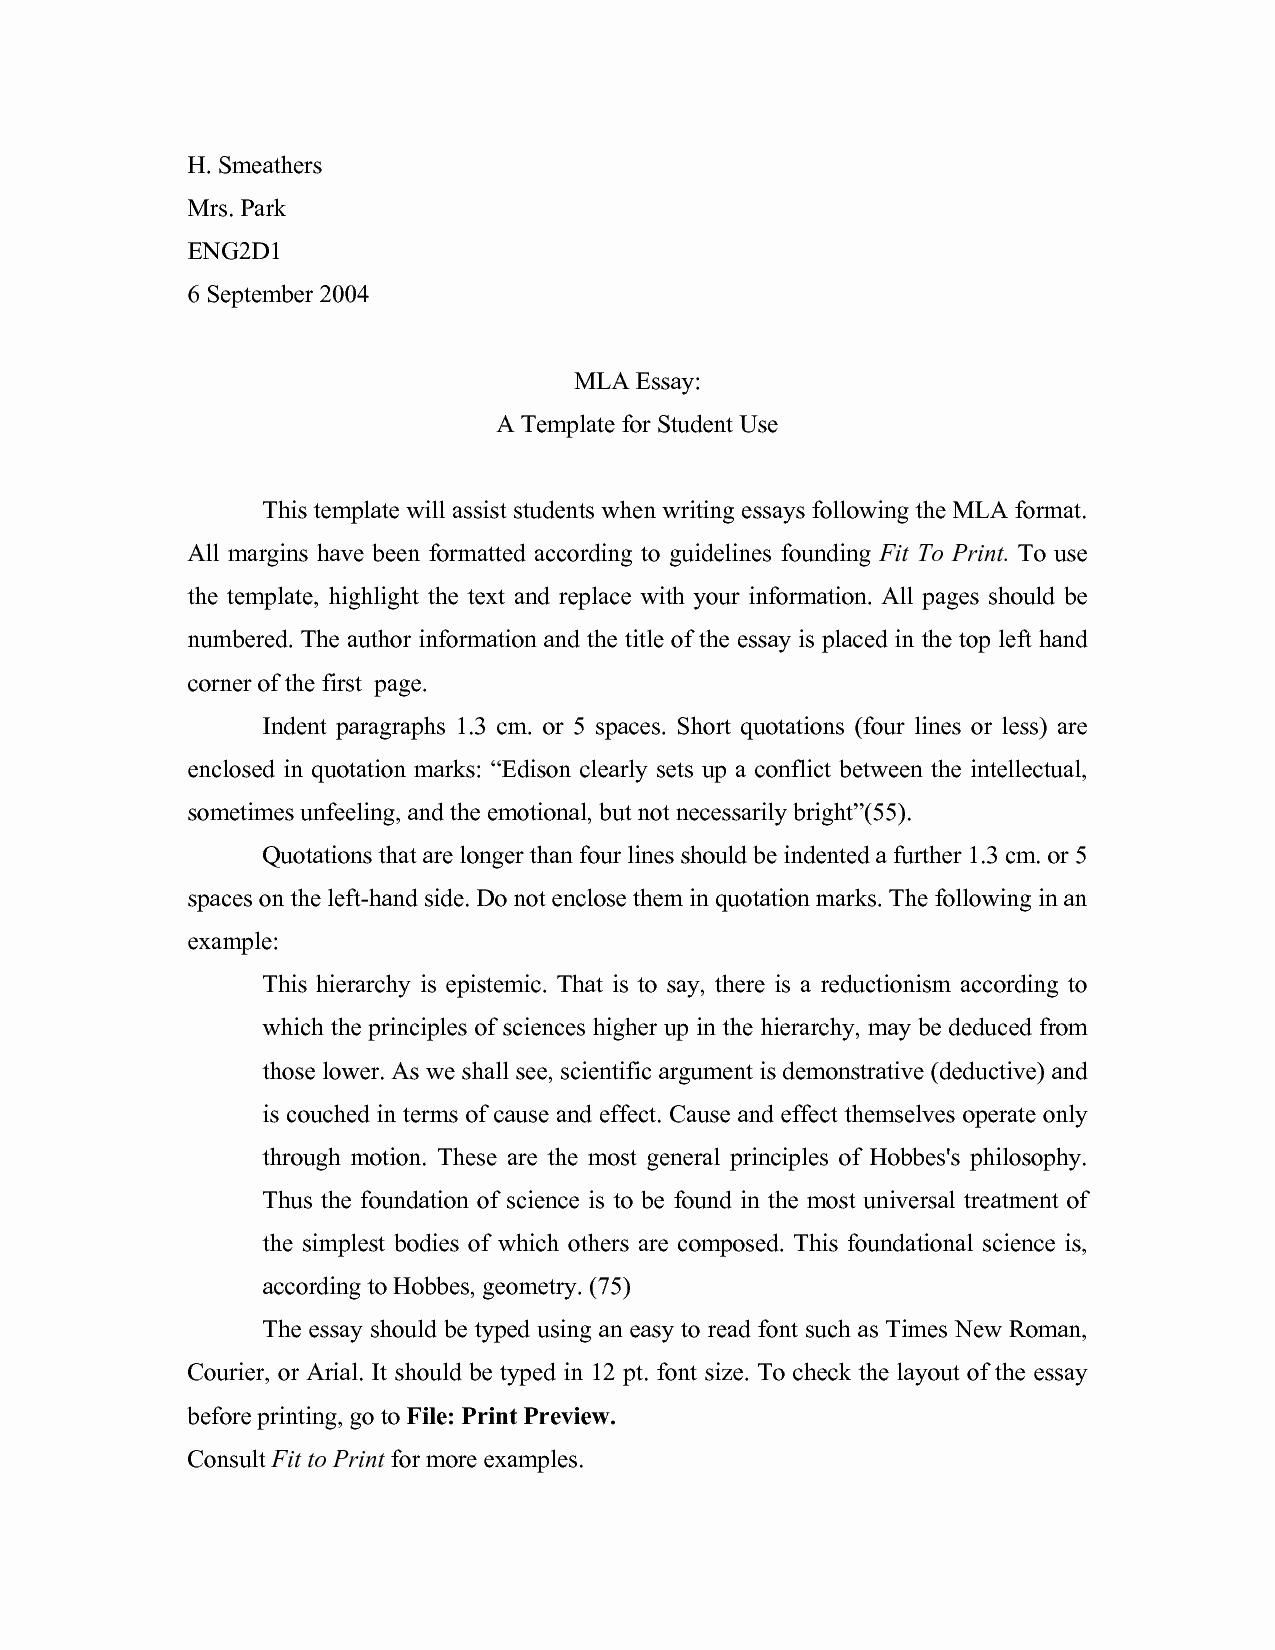 Mla format for College Essay Fresh Mla format Template